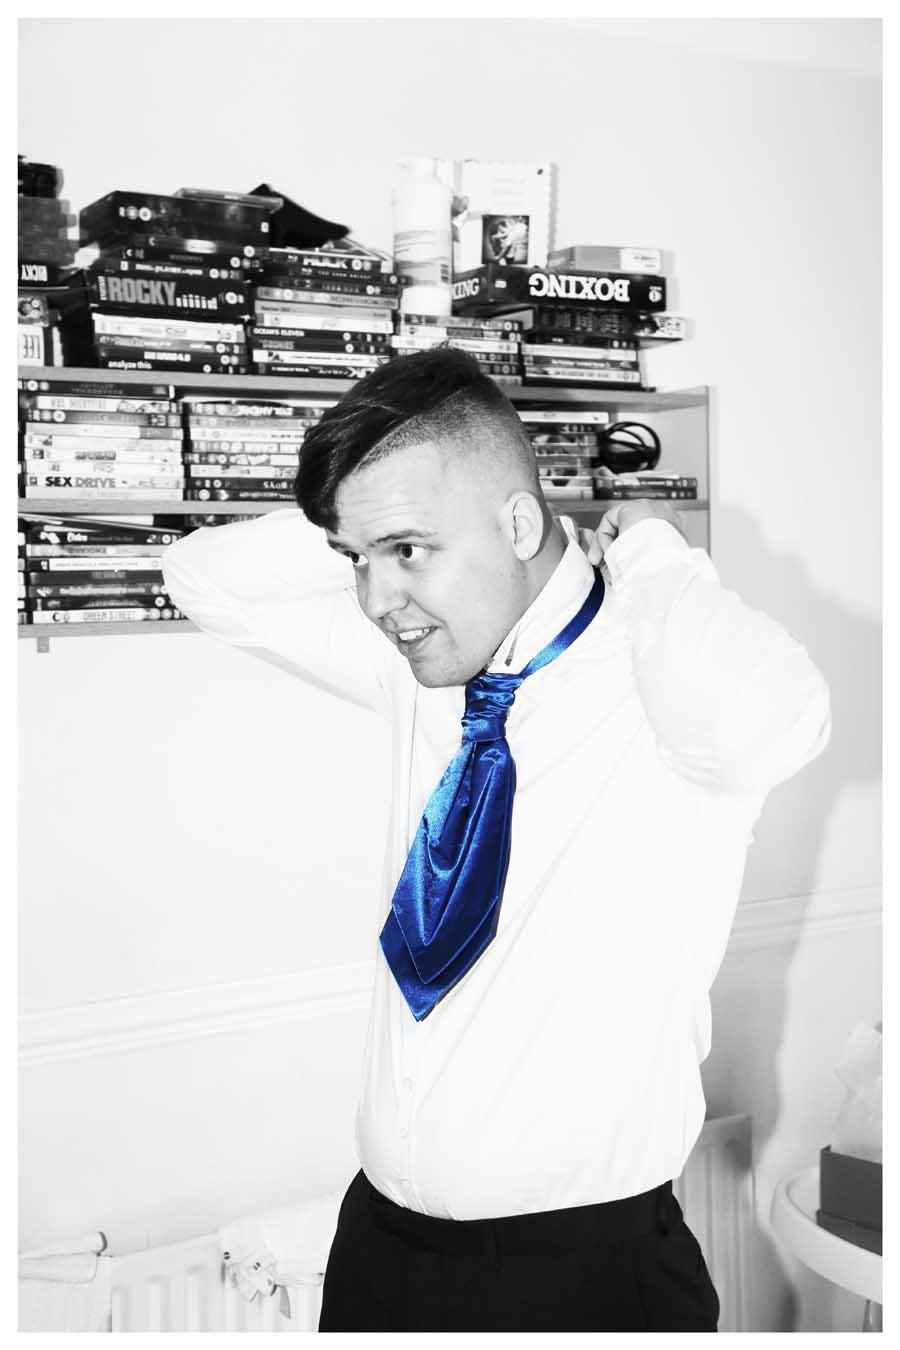 GETTING READY photos by Simeon Thaw copyright 2014 (140).jpg